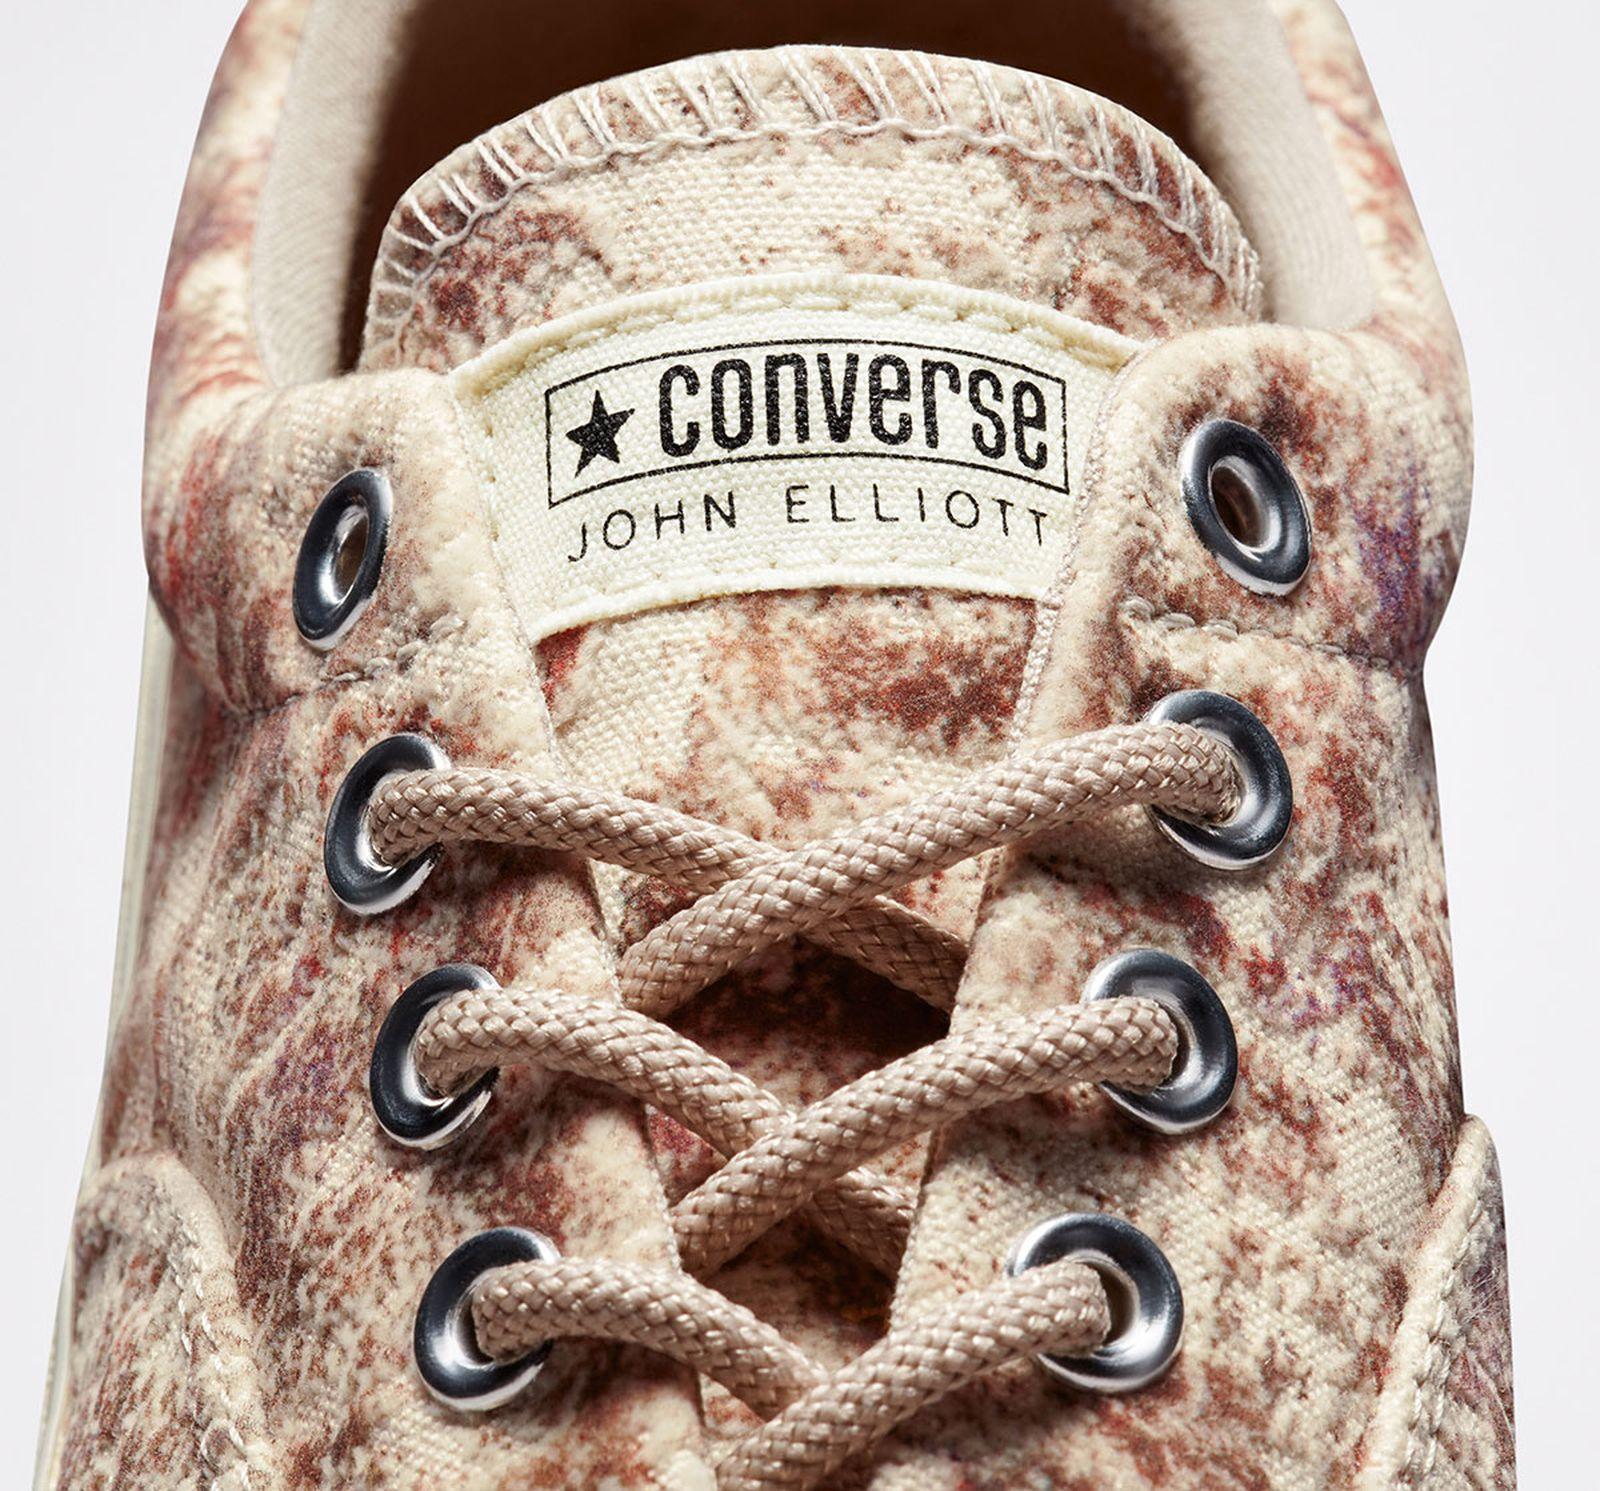 john-elliott-converse-skidgrip-release-date-price-07